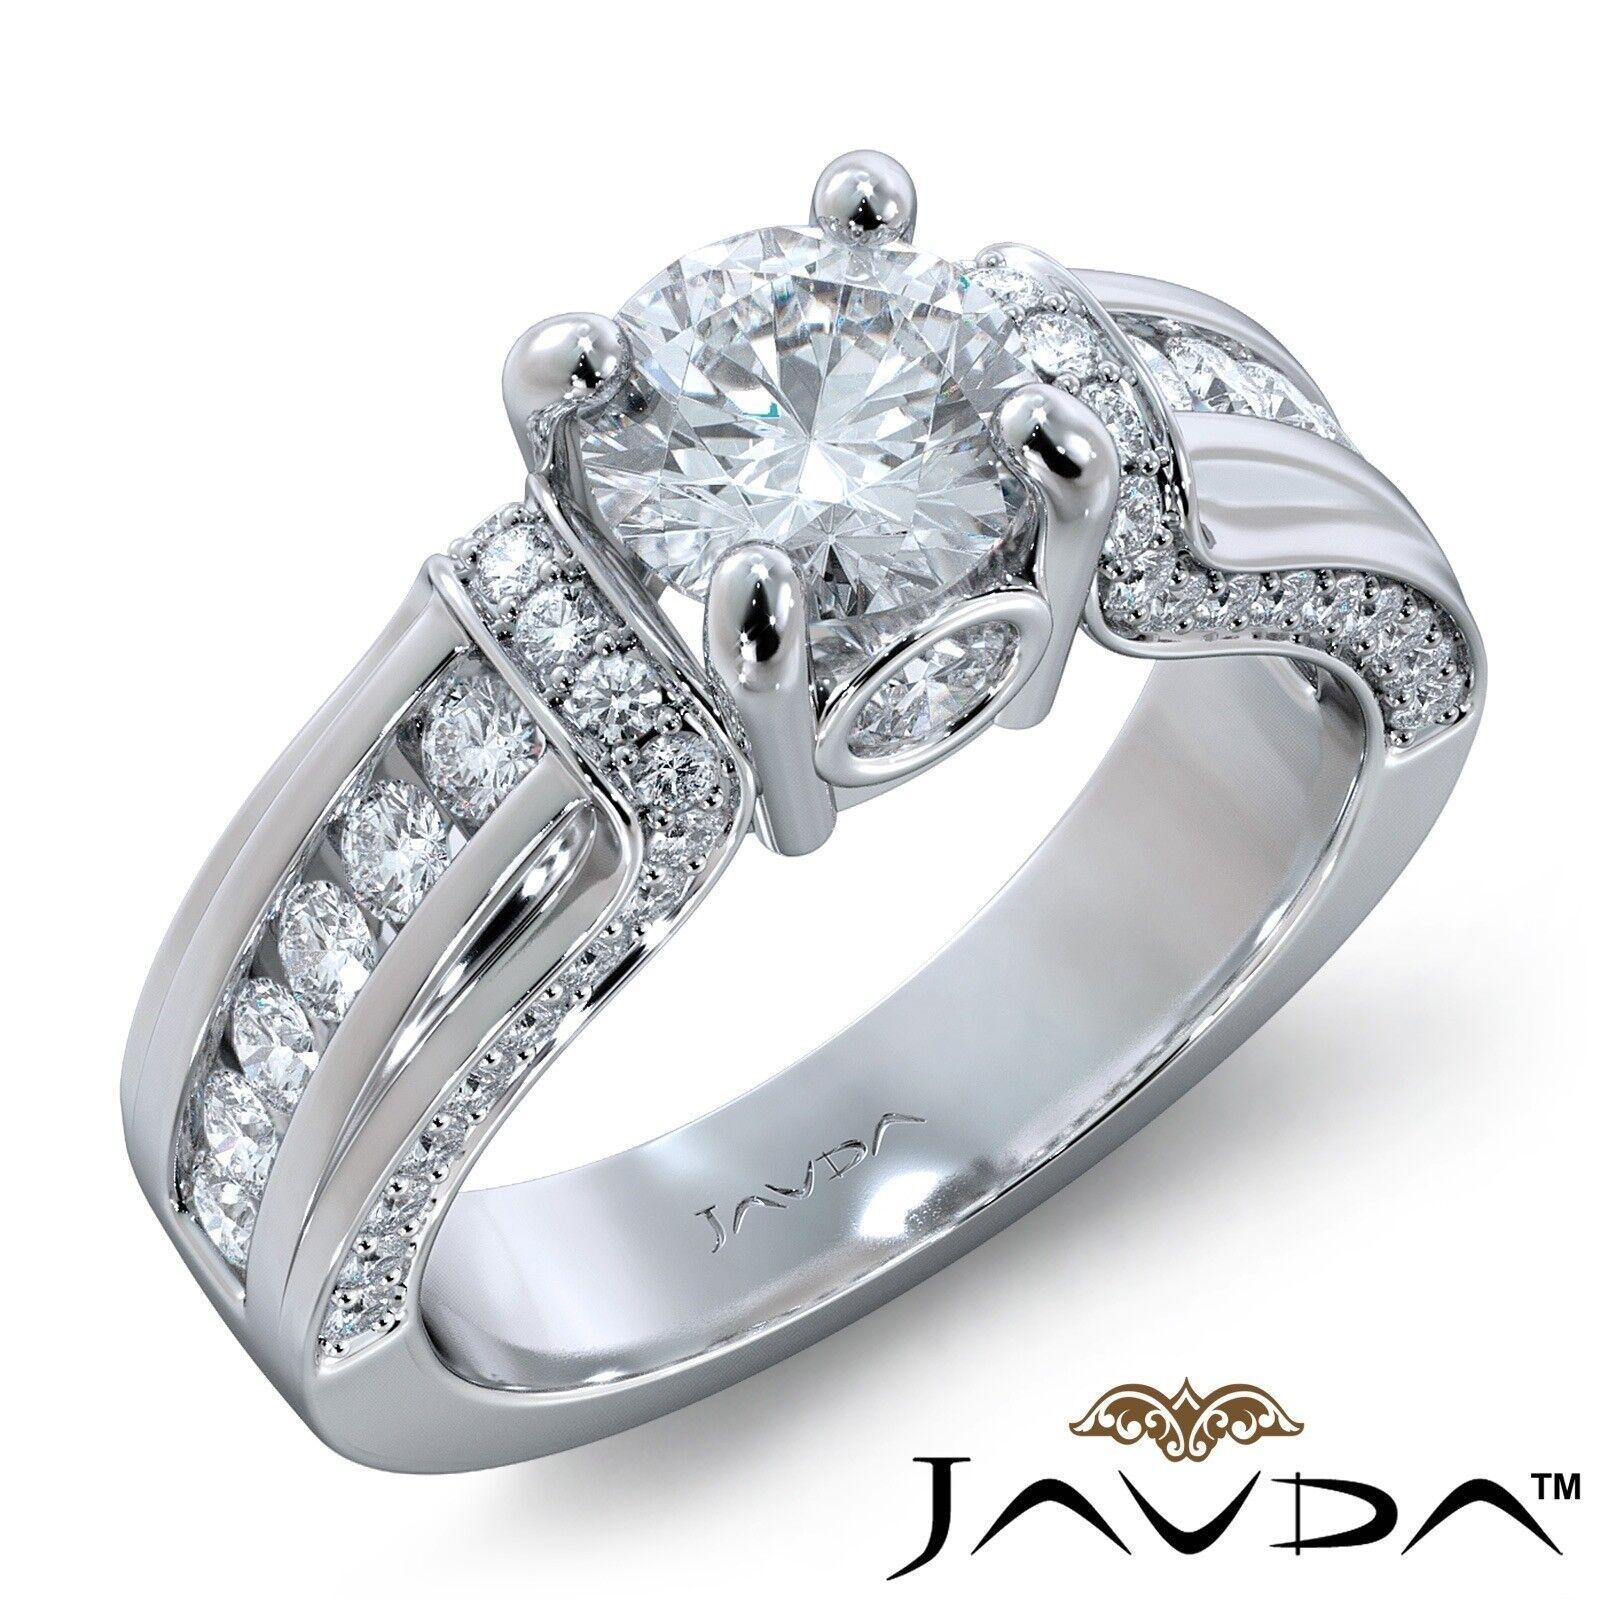 1.7ctw Channel Set Sidestone Round Diamond Engagement Ring GIA F-VS1 White Gold